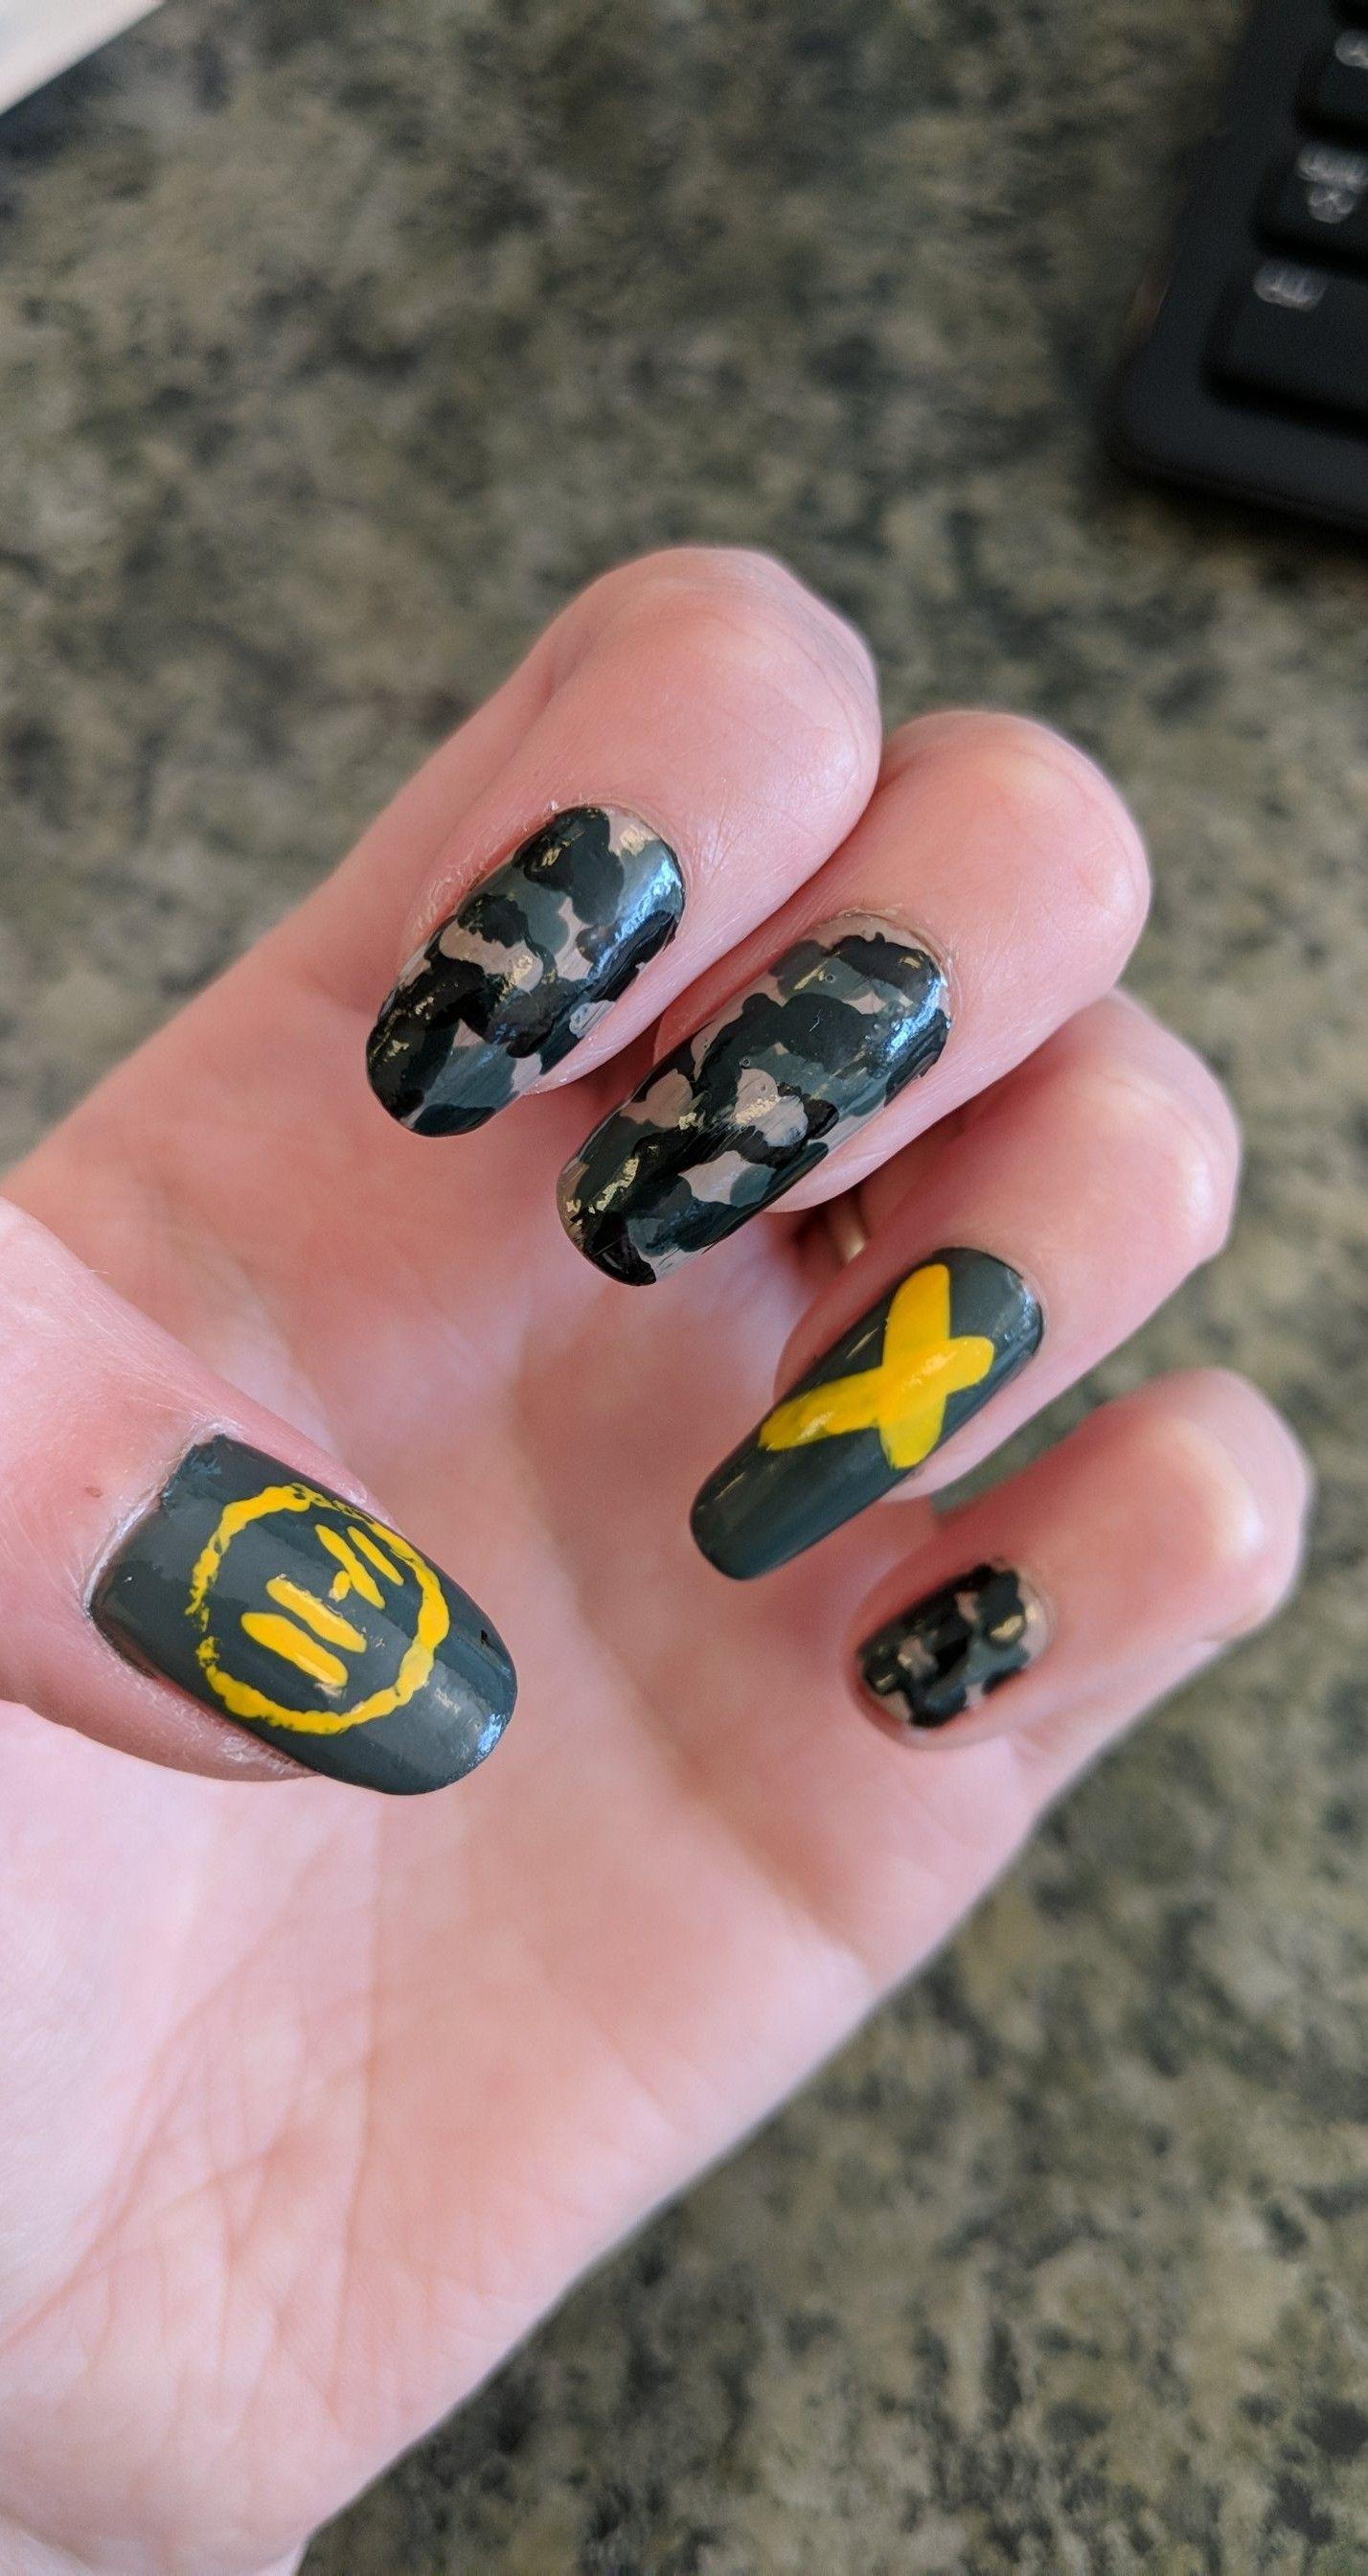 Twenty One Pilots Nail Art Yellow Camo Nail Art Camo Nails Music Nails